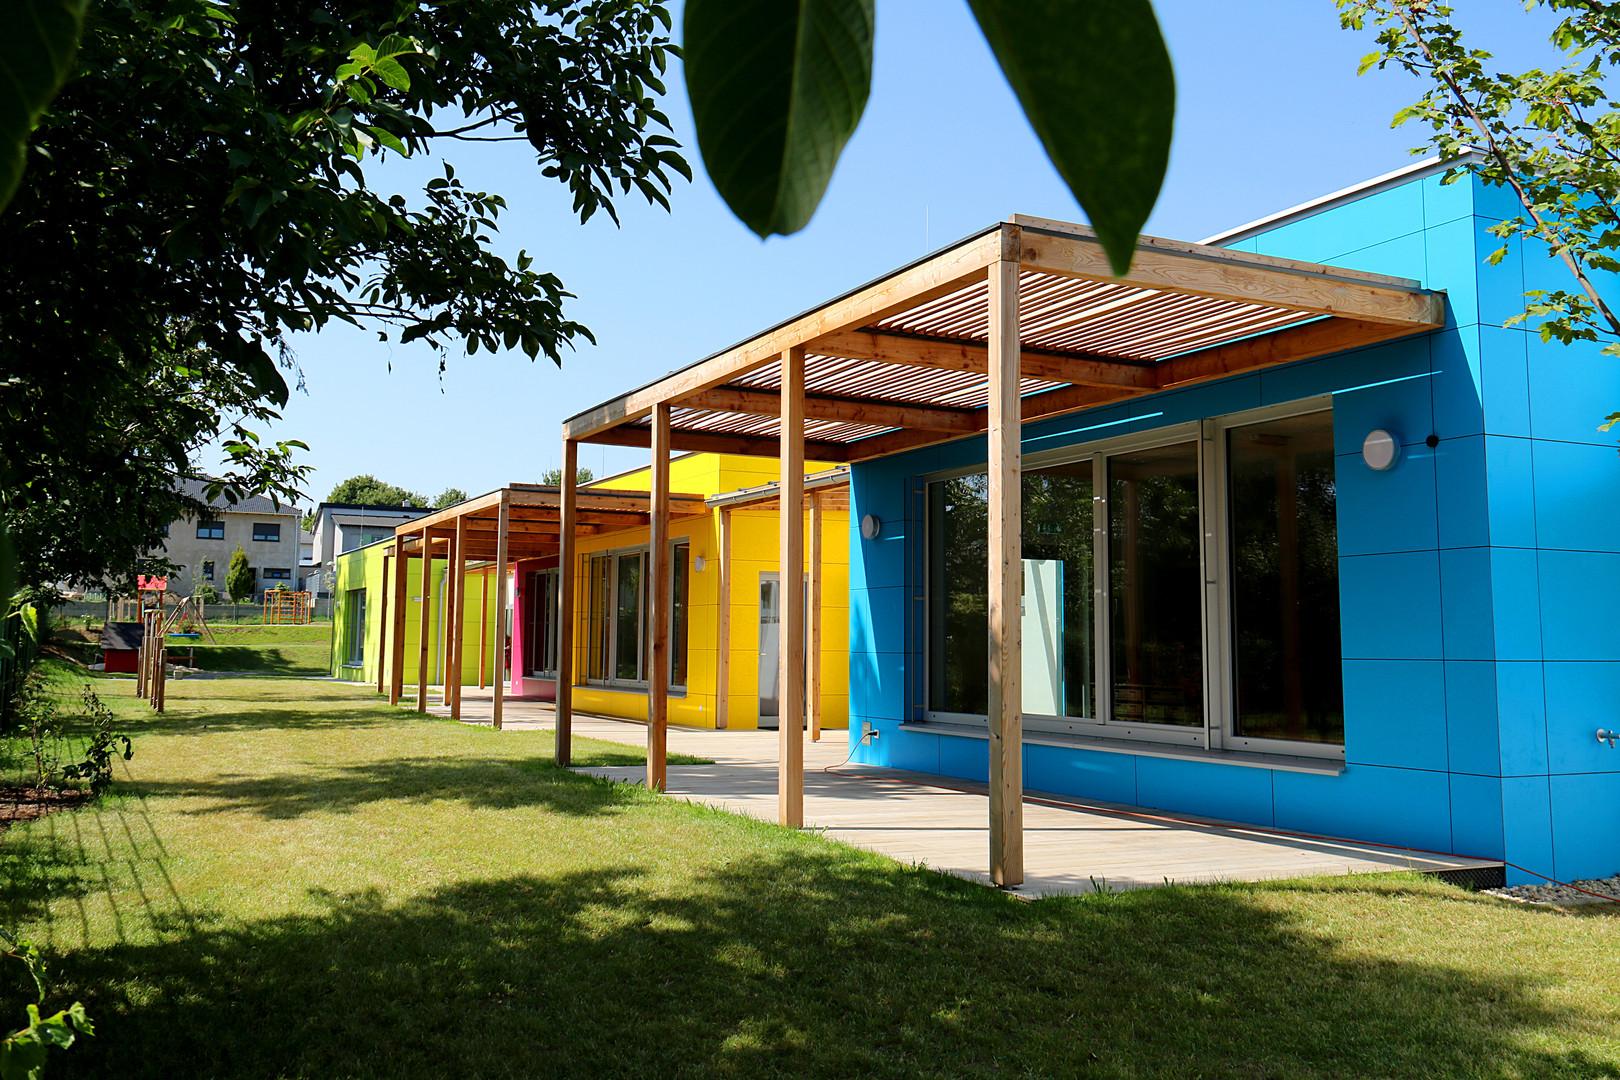 Kindergarten Mistelbach